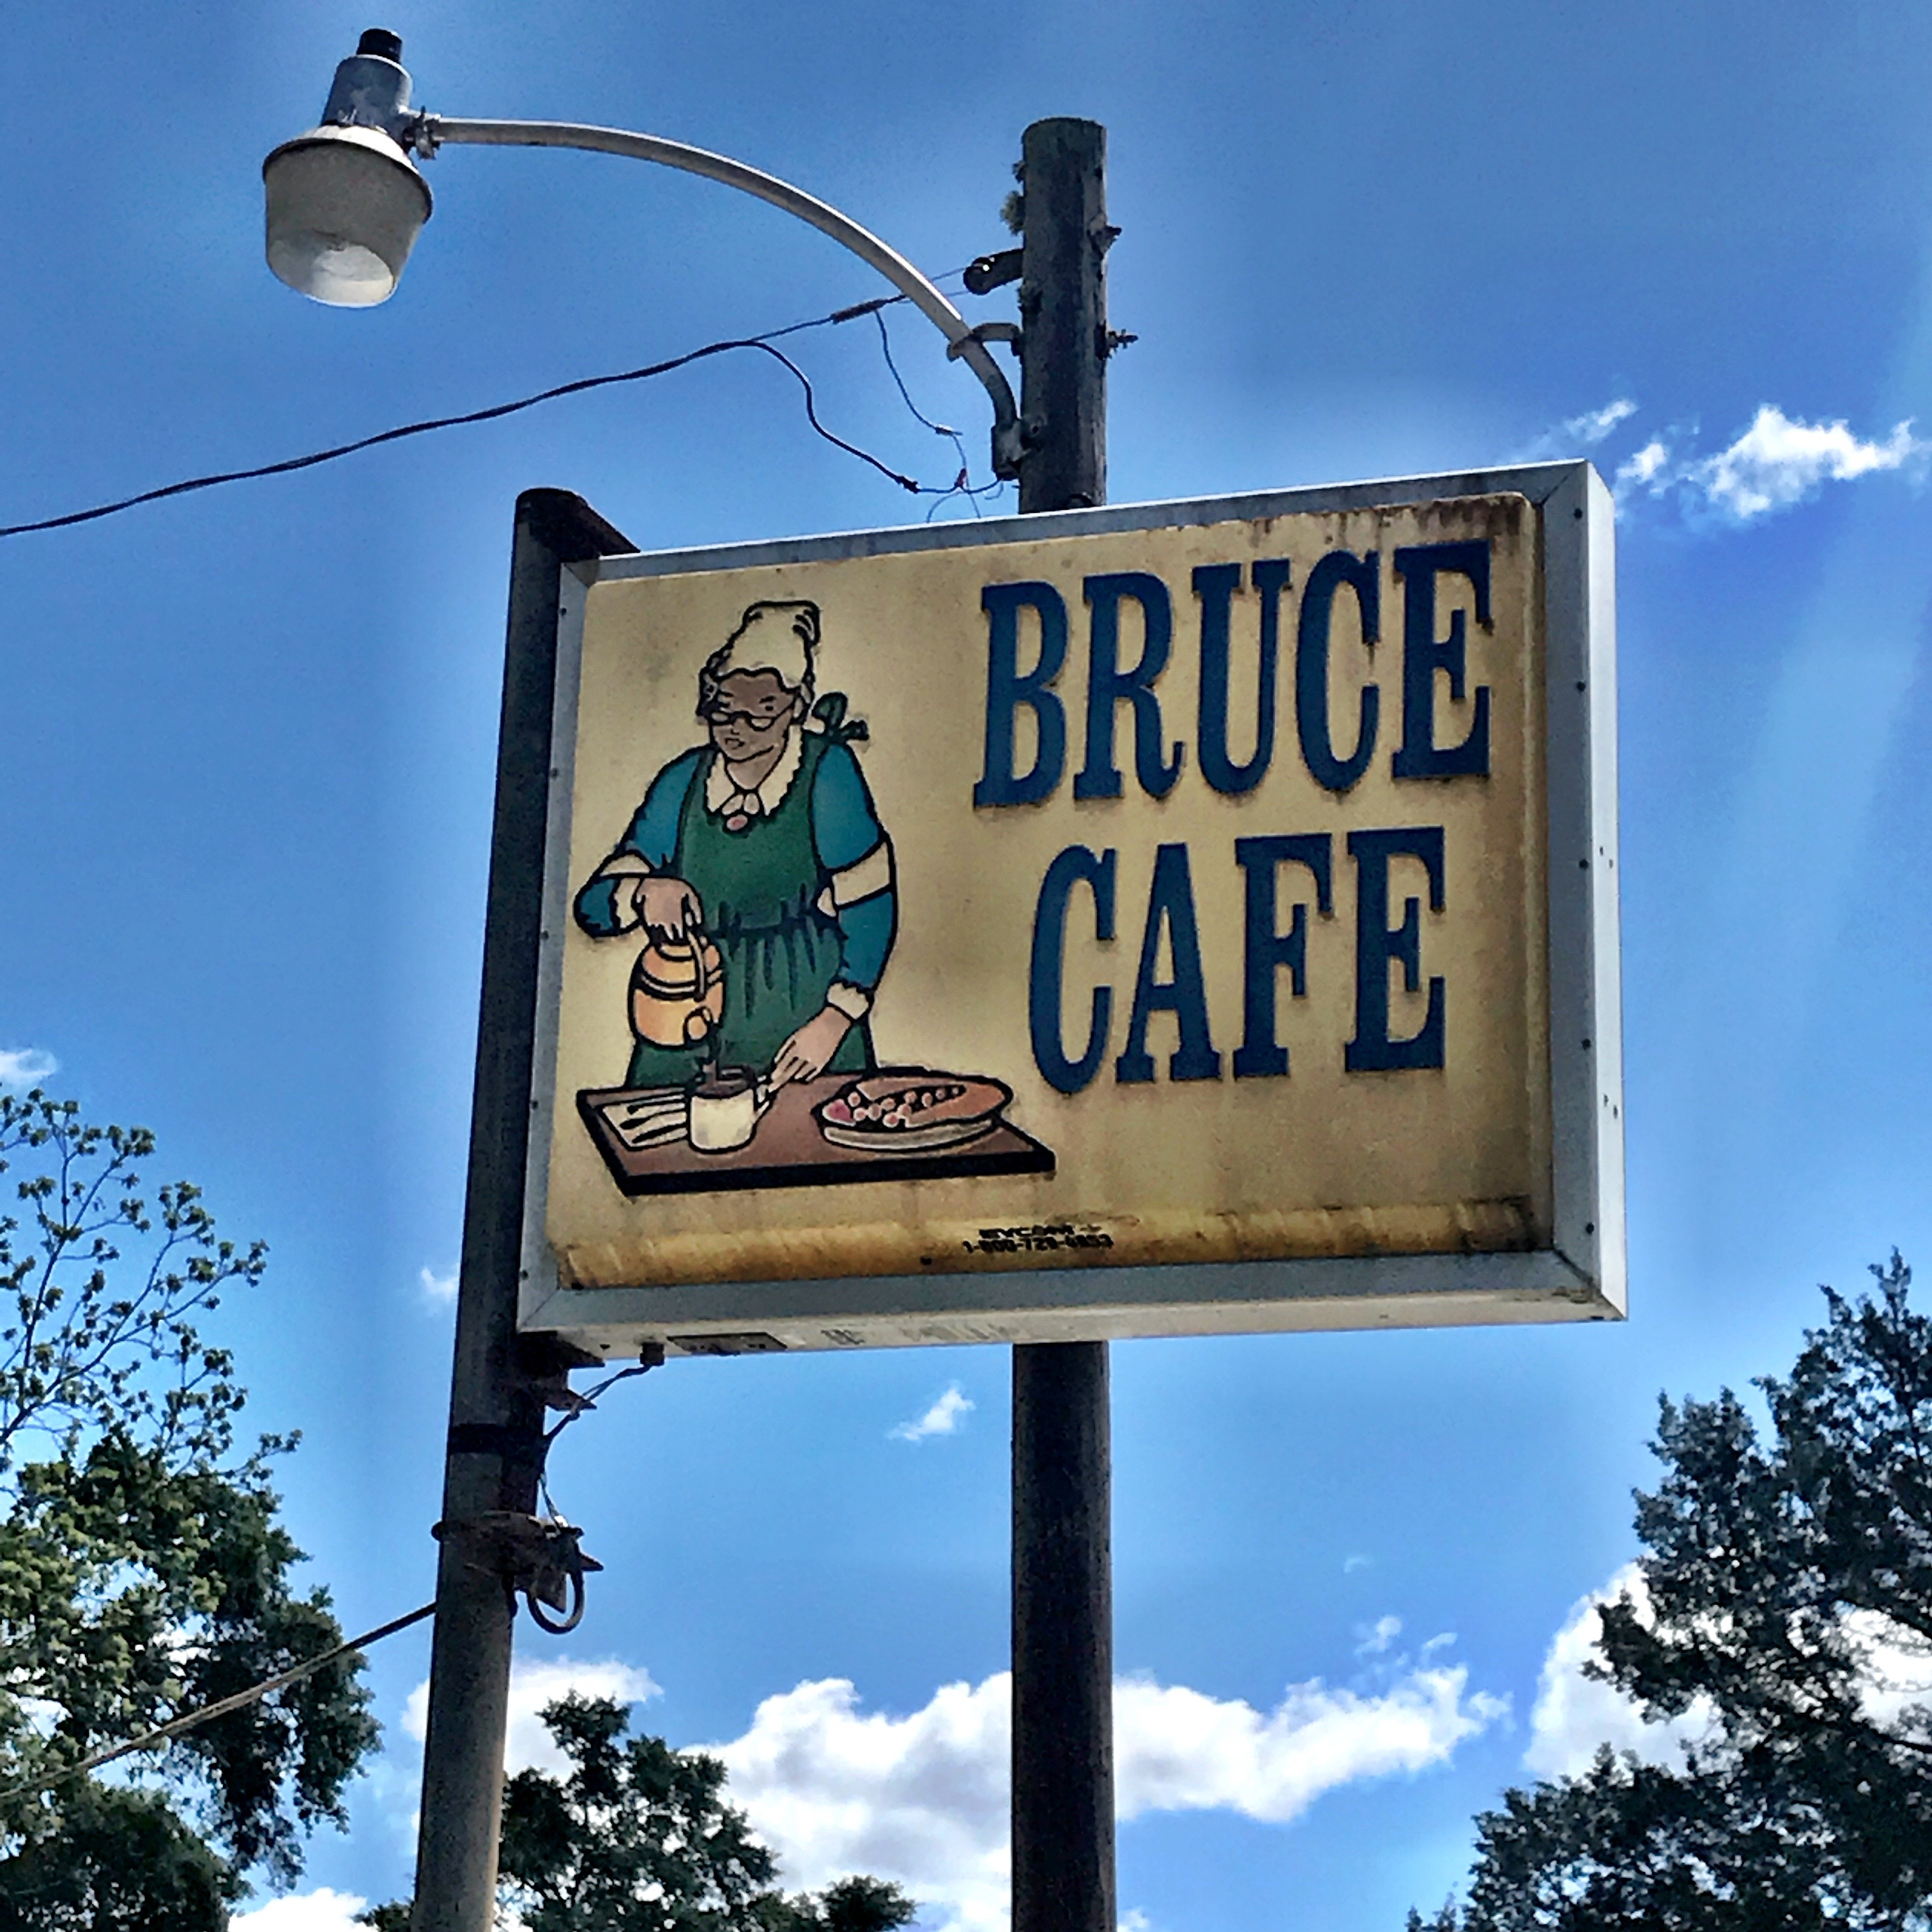 Bruce Cafe